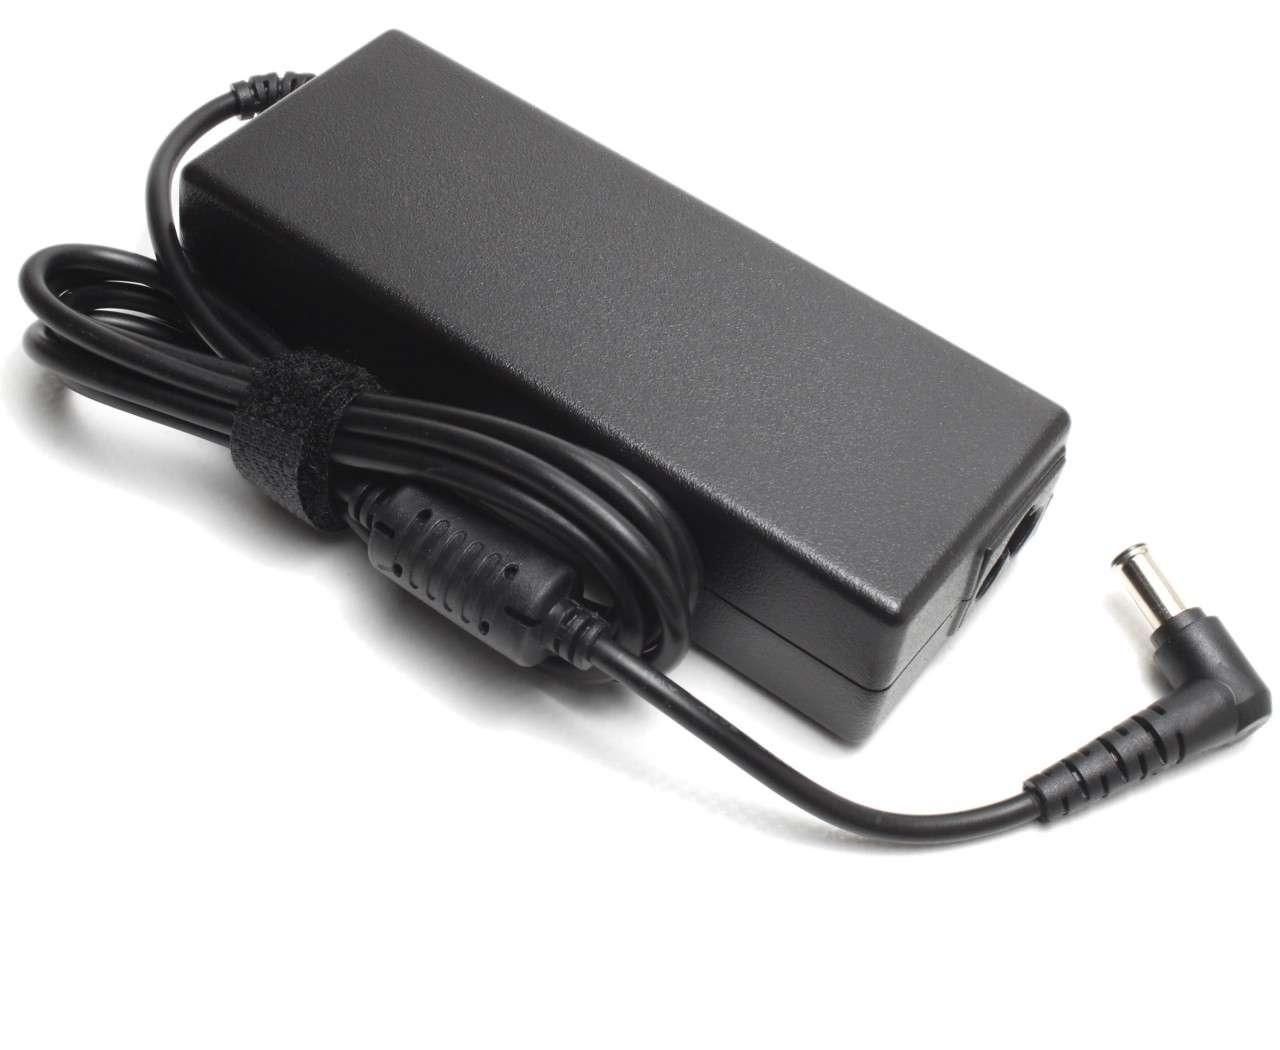 Incarcator Sony Vaio VPCEB2UGX Replacement imagine powerlaptop.ro 2021